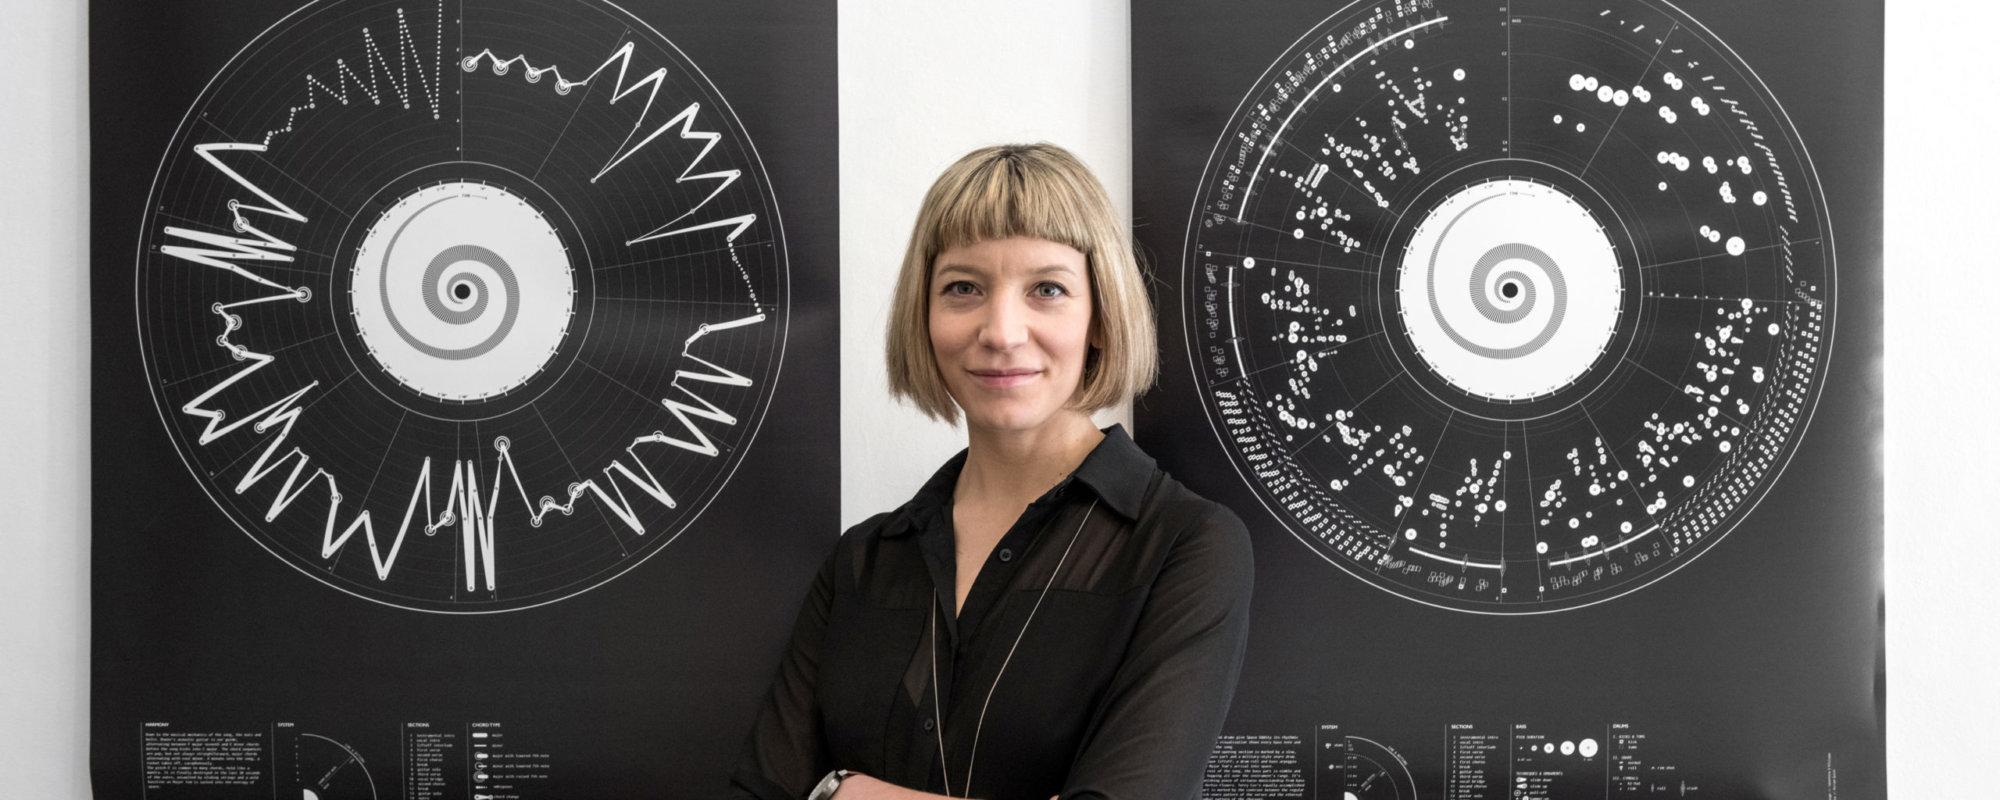 Valentina D'Efilippo - Wild Mazzini data art gallery- Torino